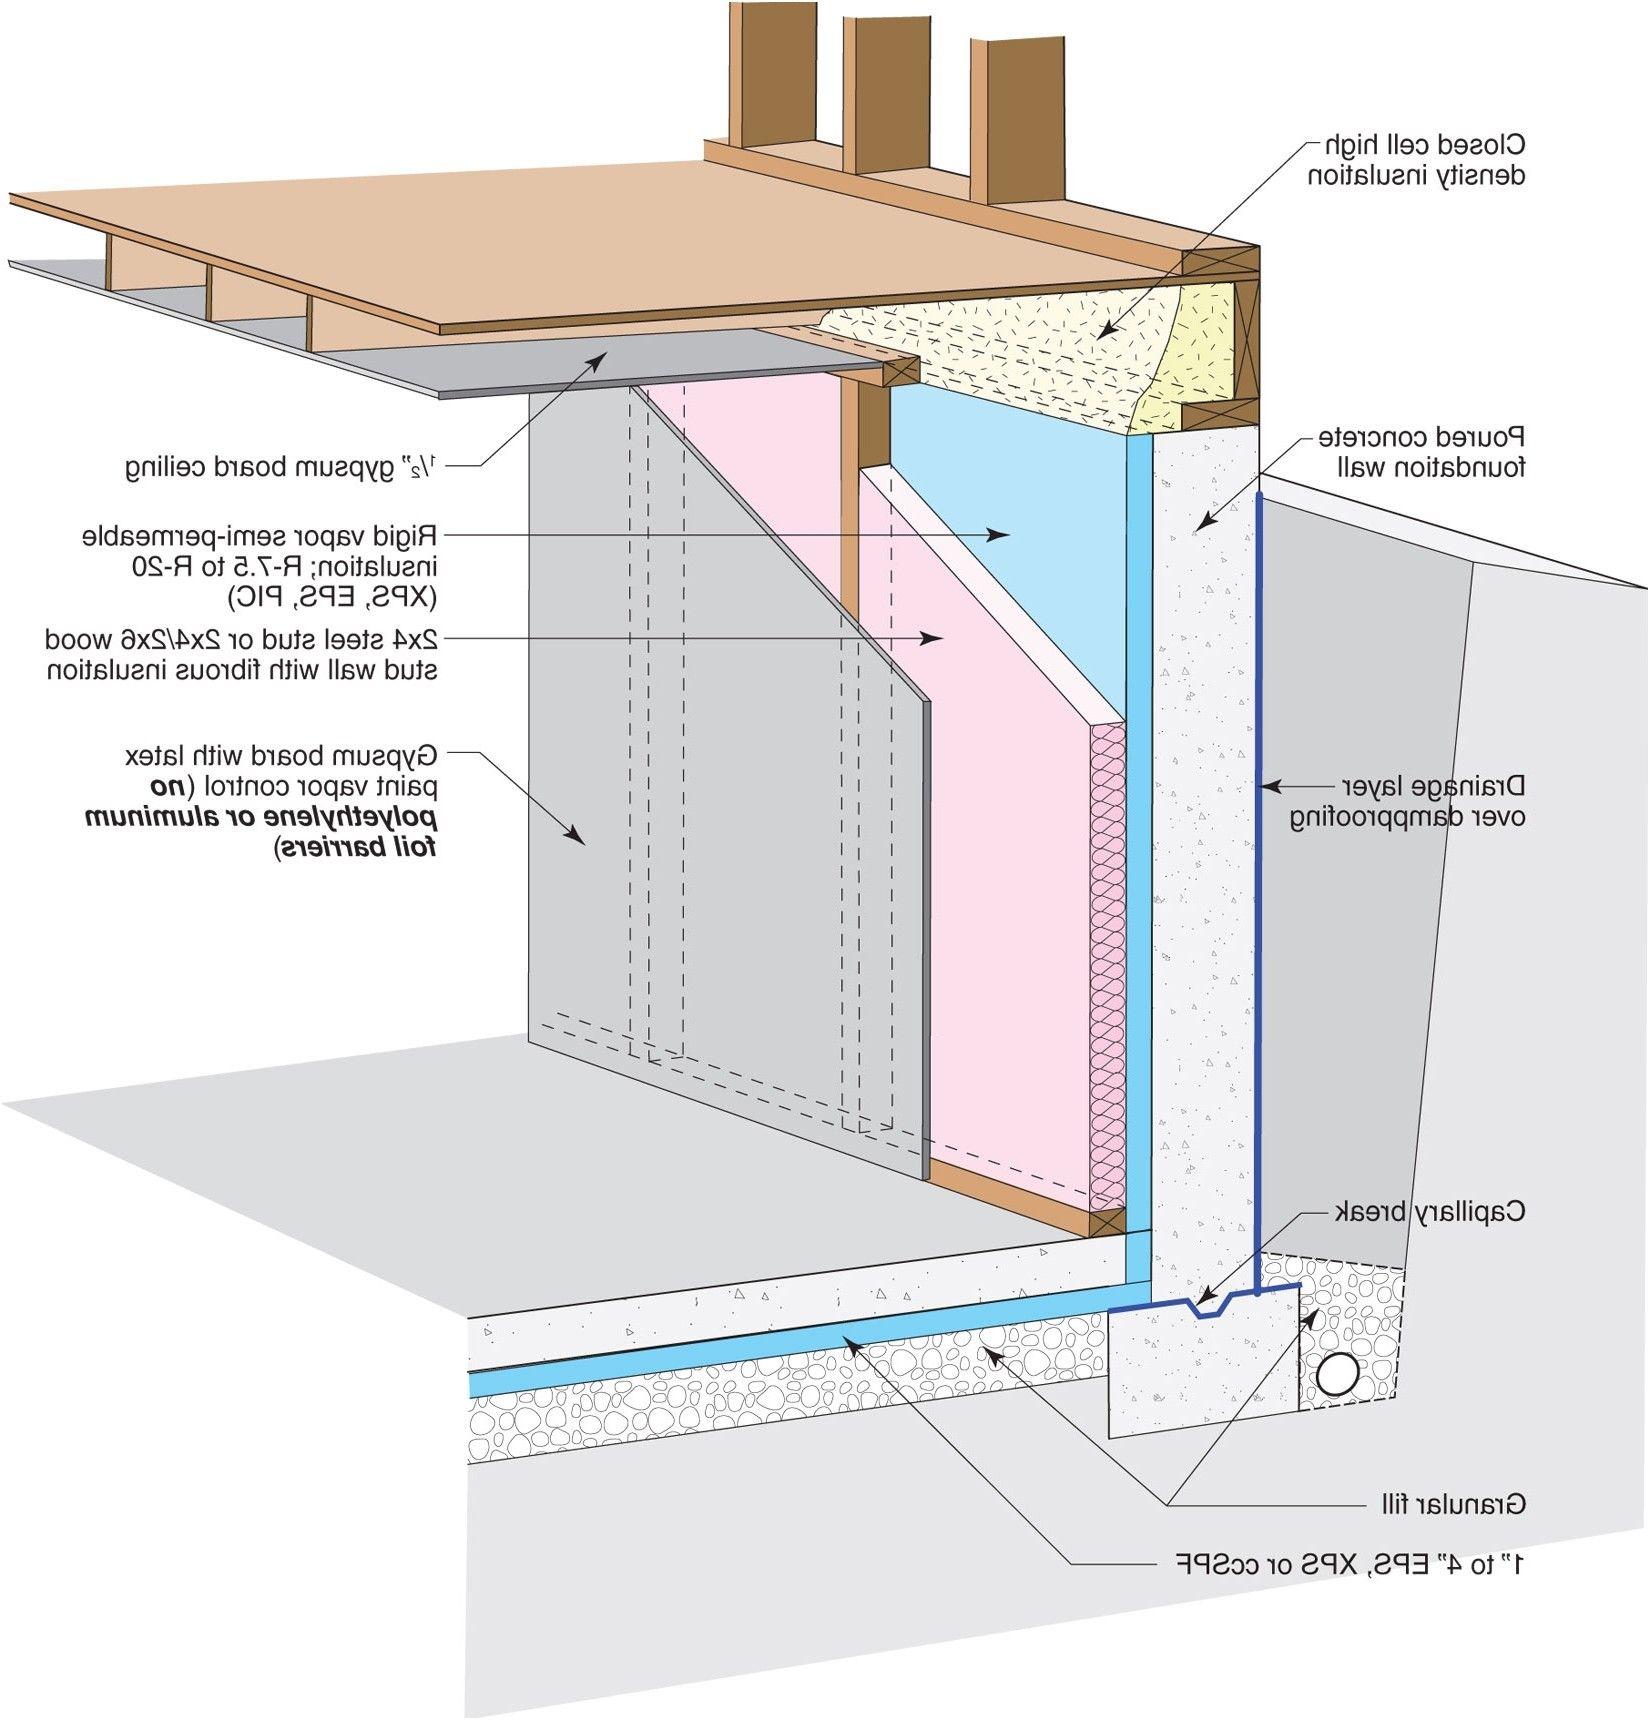 Foam Under Footings From Ontario Building Code Basement